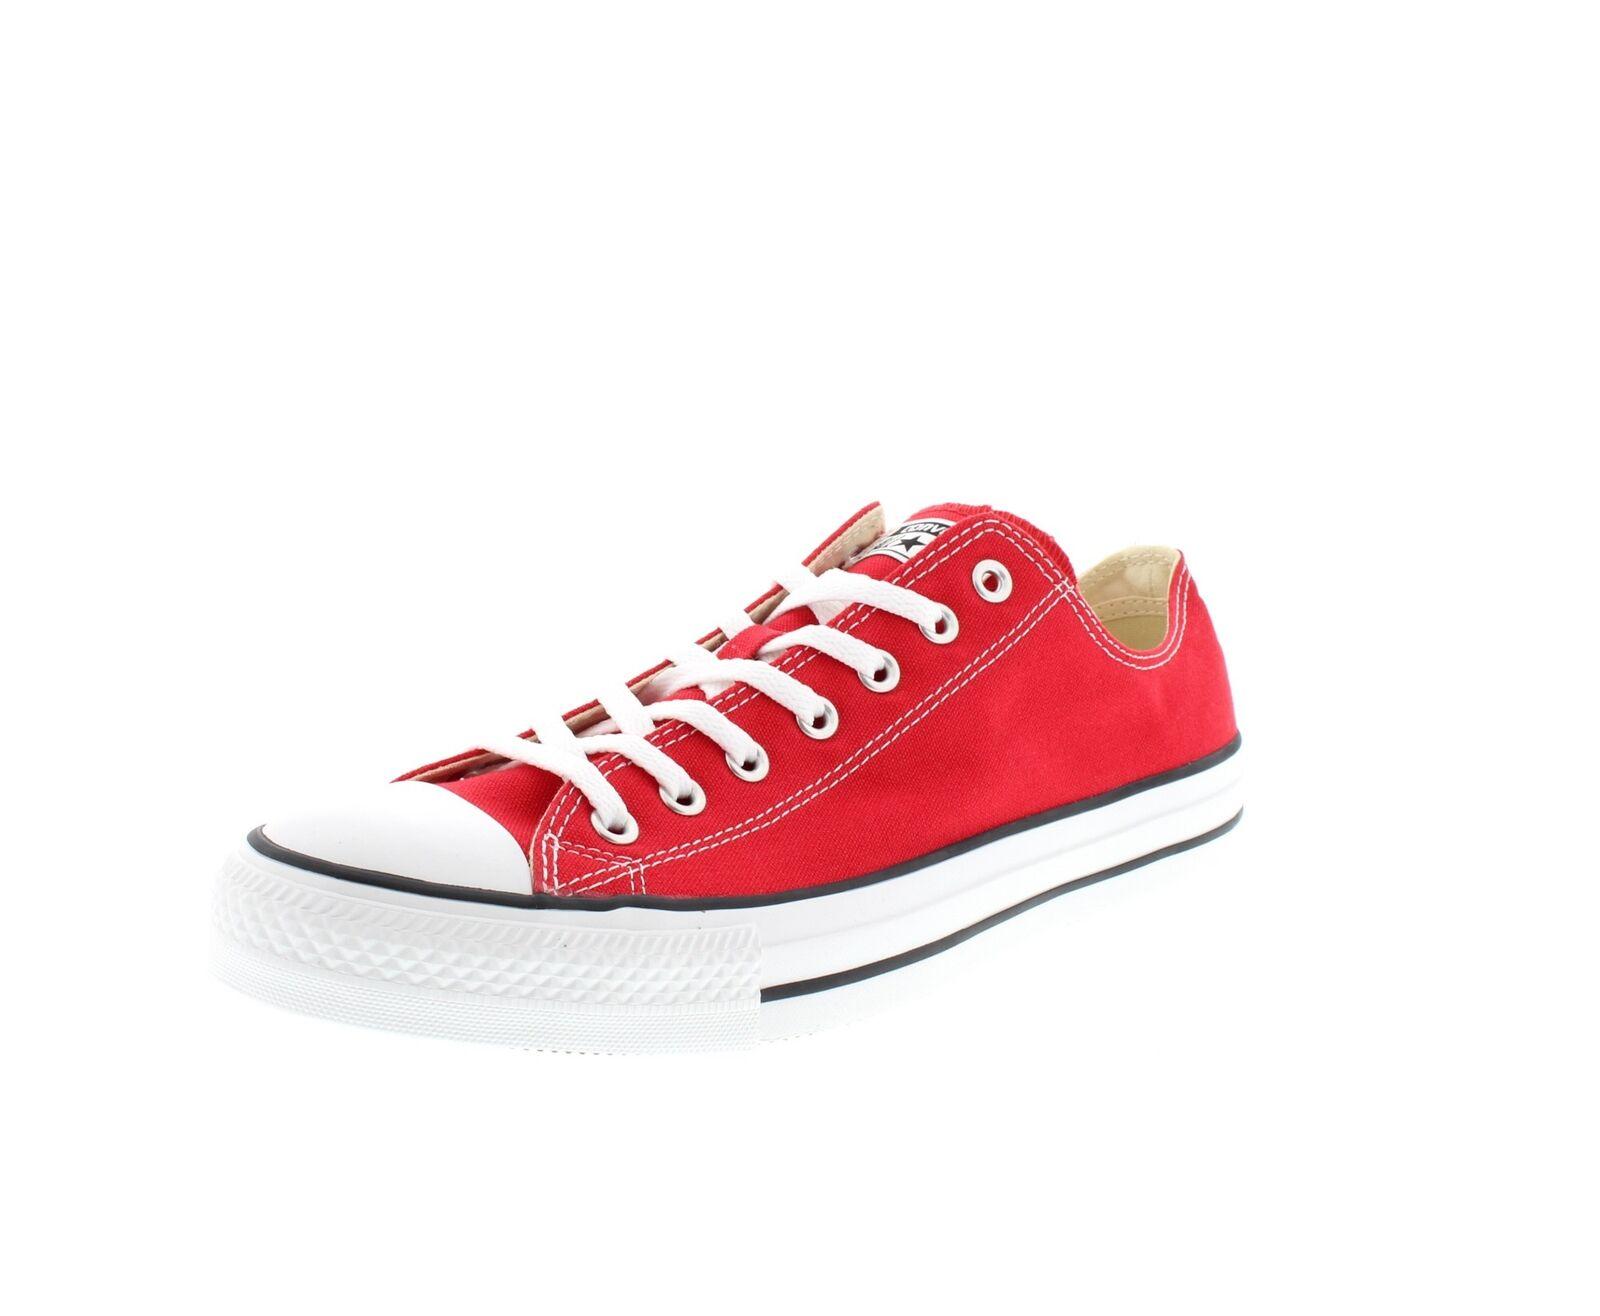 CONVERSE in Übergröße Chucks ALL STAR OX 9696 - rot rot rot 81321e